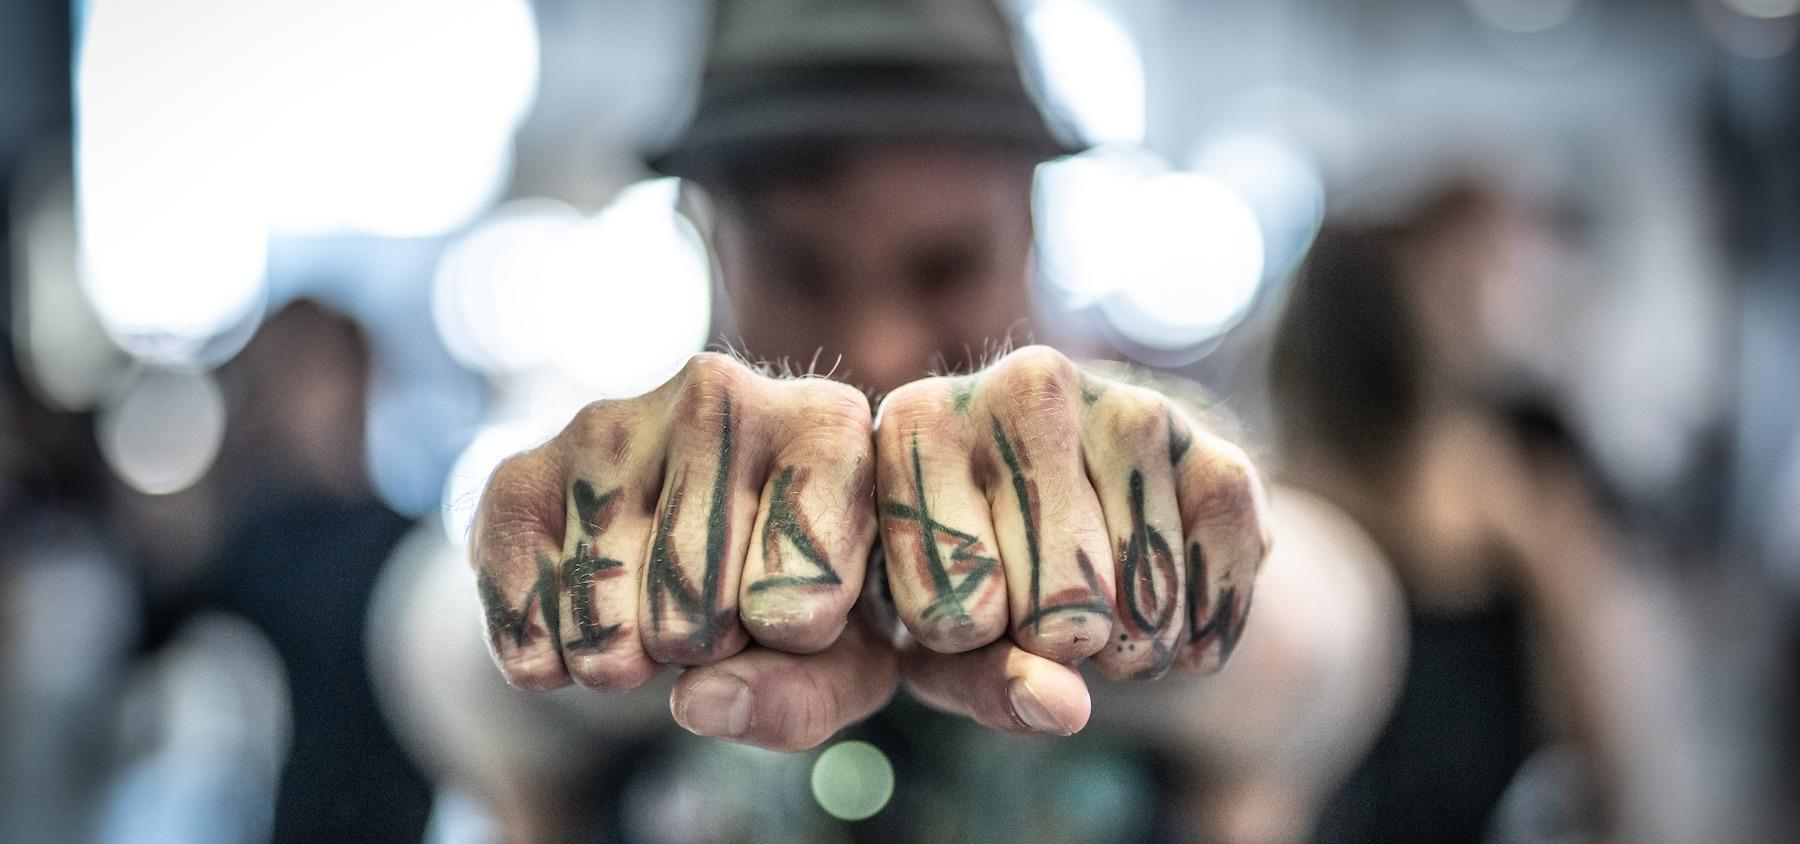 Już w ten weekend rusza WROCŁAW Tattoo Konwent!